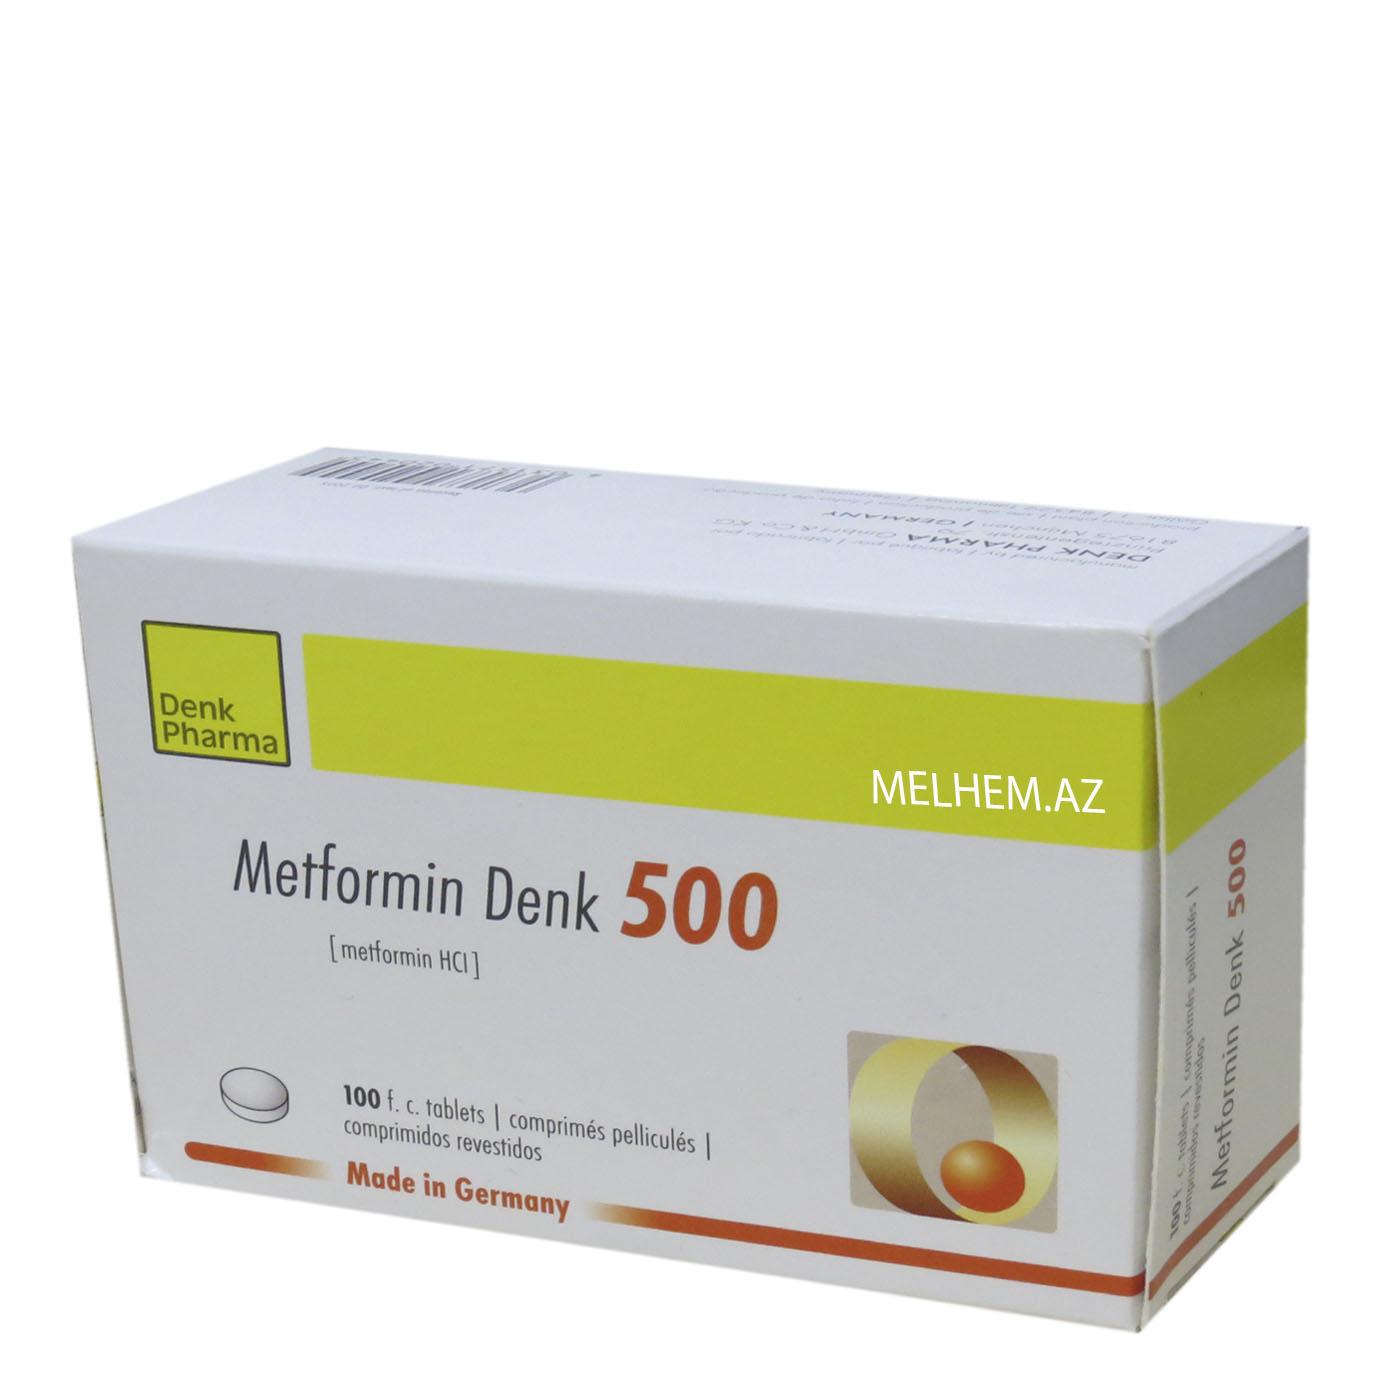 METFORMİN DENK 500